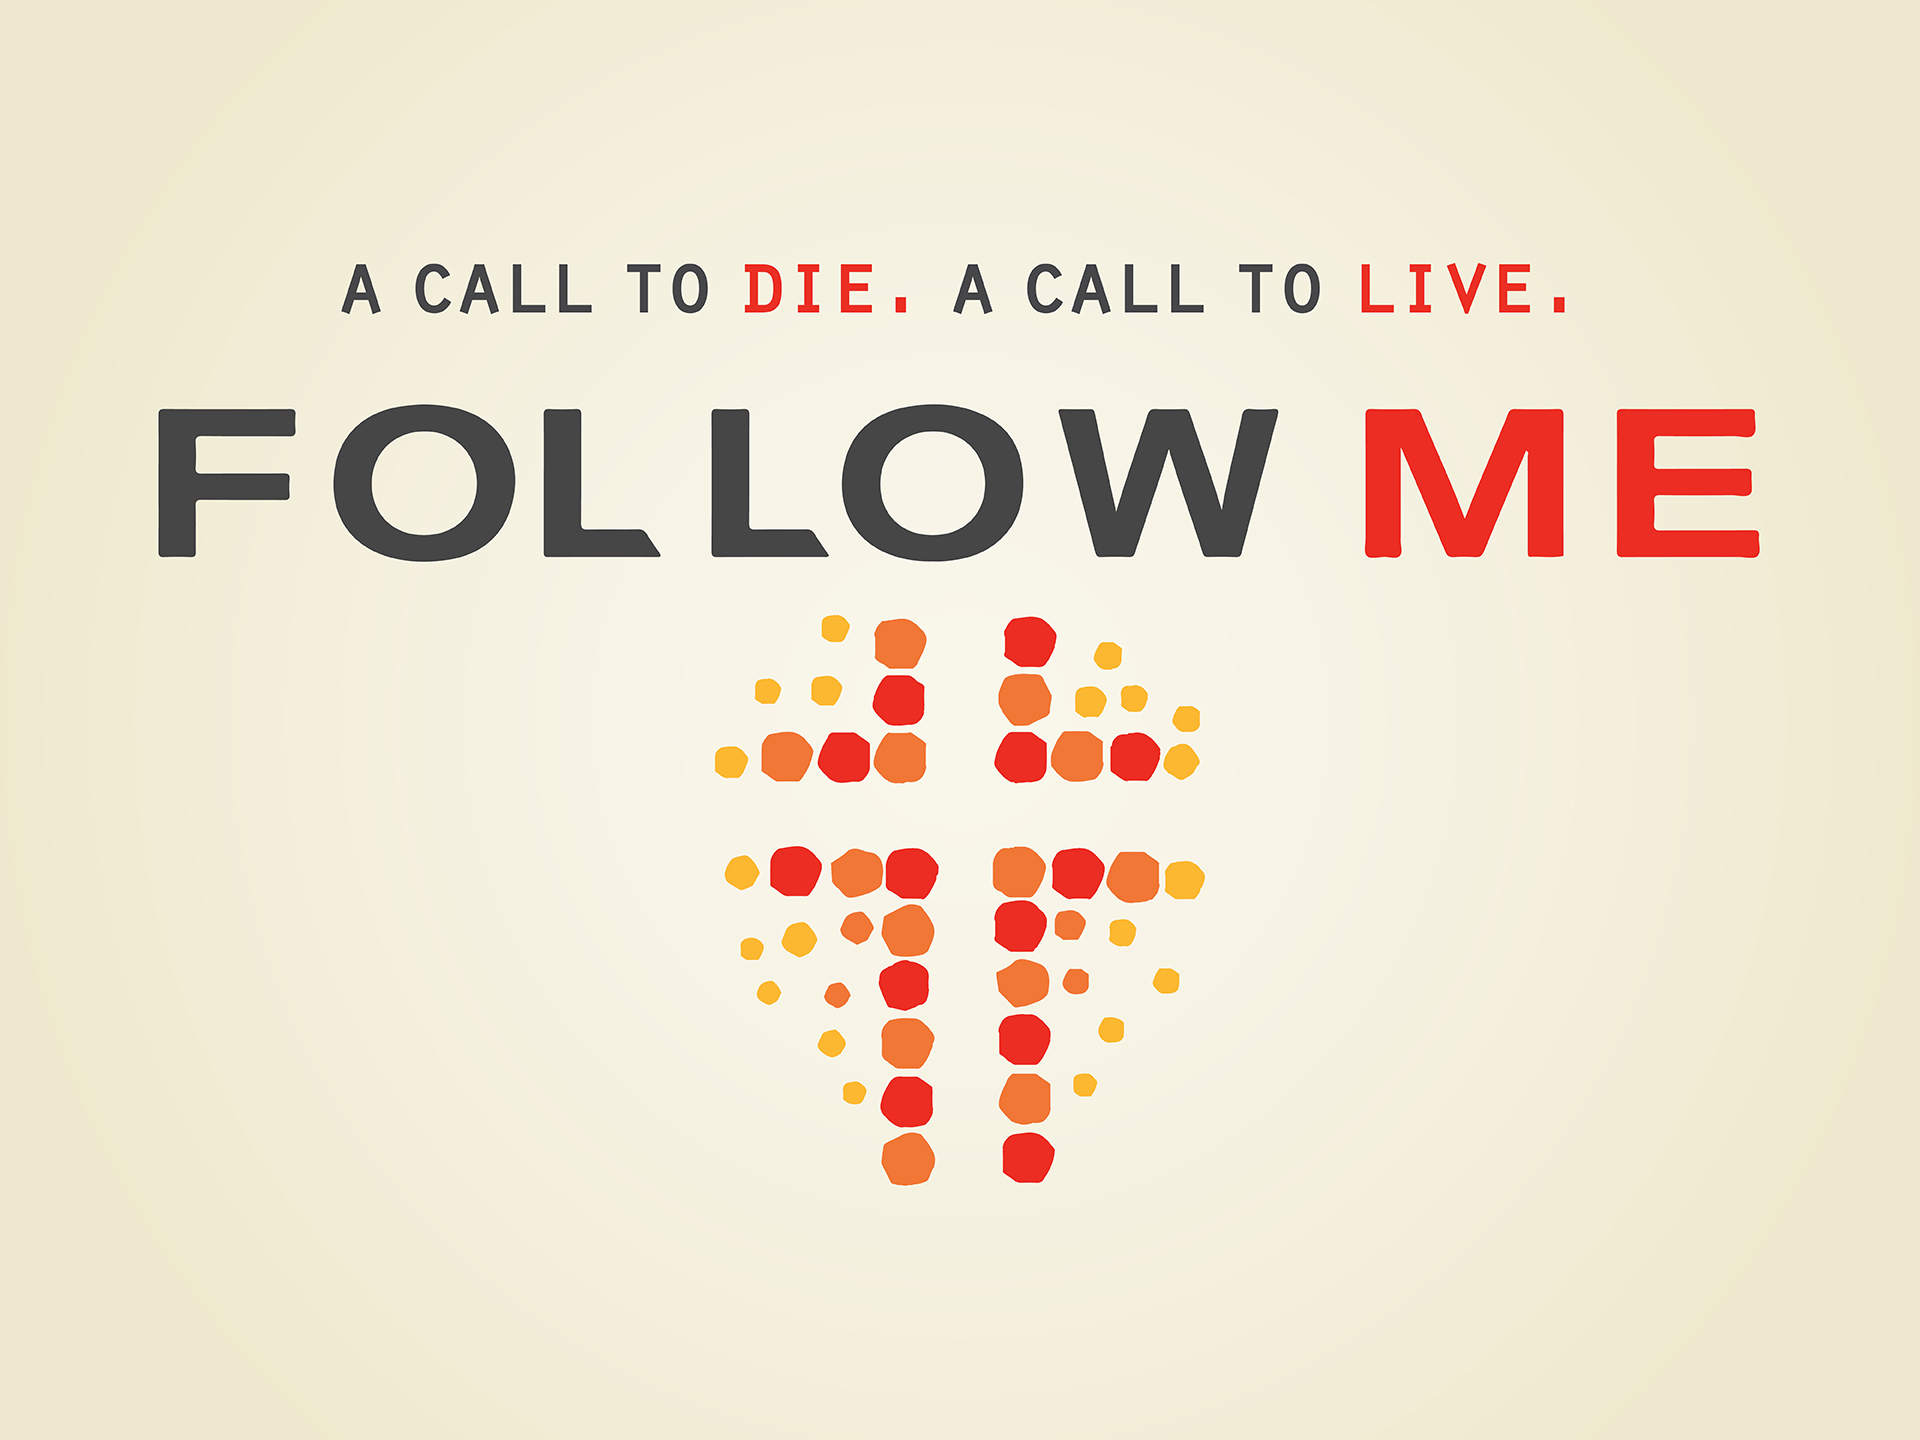 FollowMePlatt_1920x1440